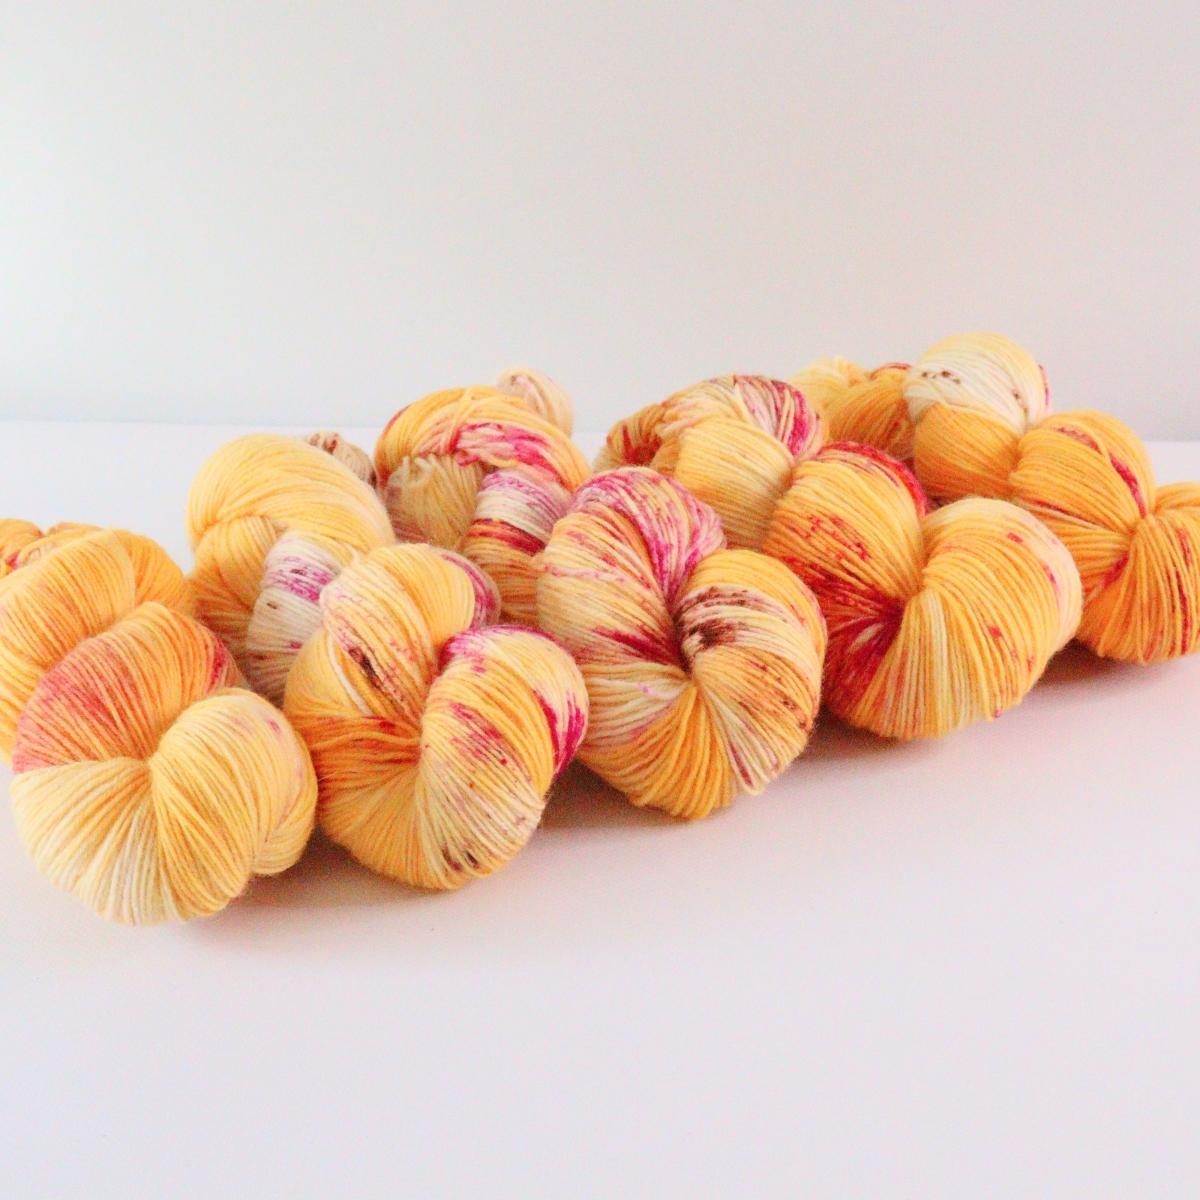 woodico.pro hand dyed yarn 077 3 1200x1200 - Hand dyed yarn / 077